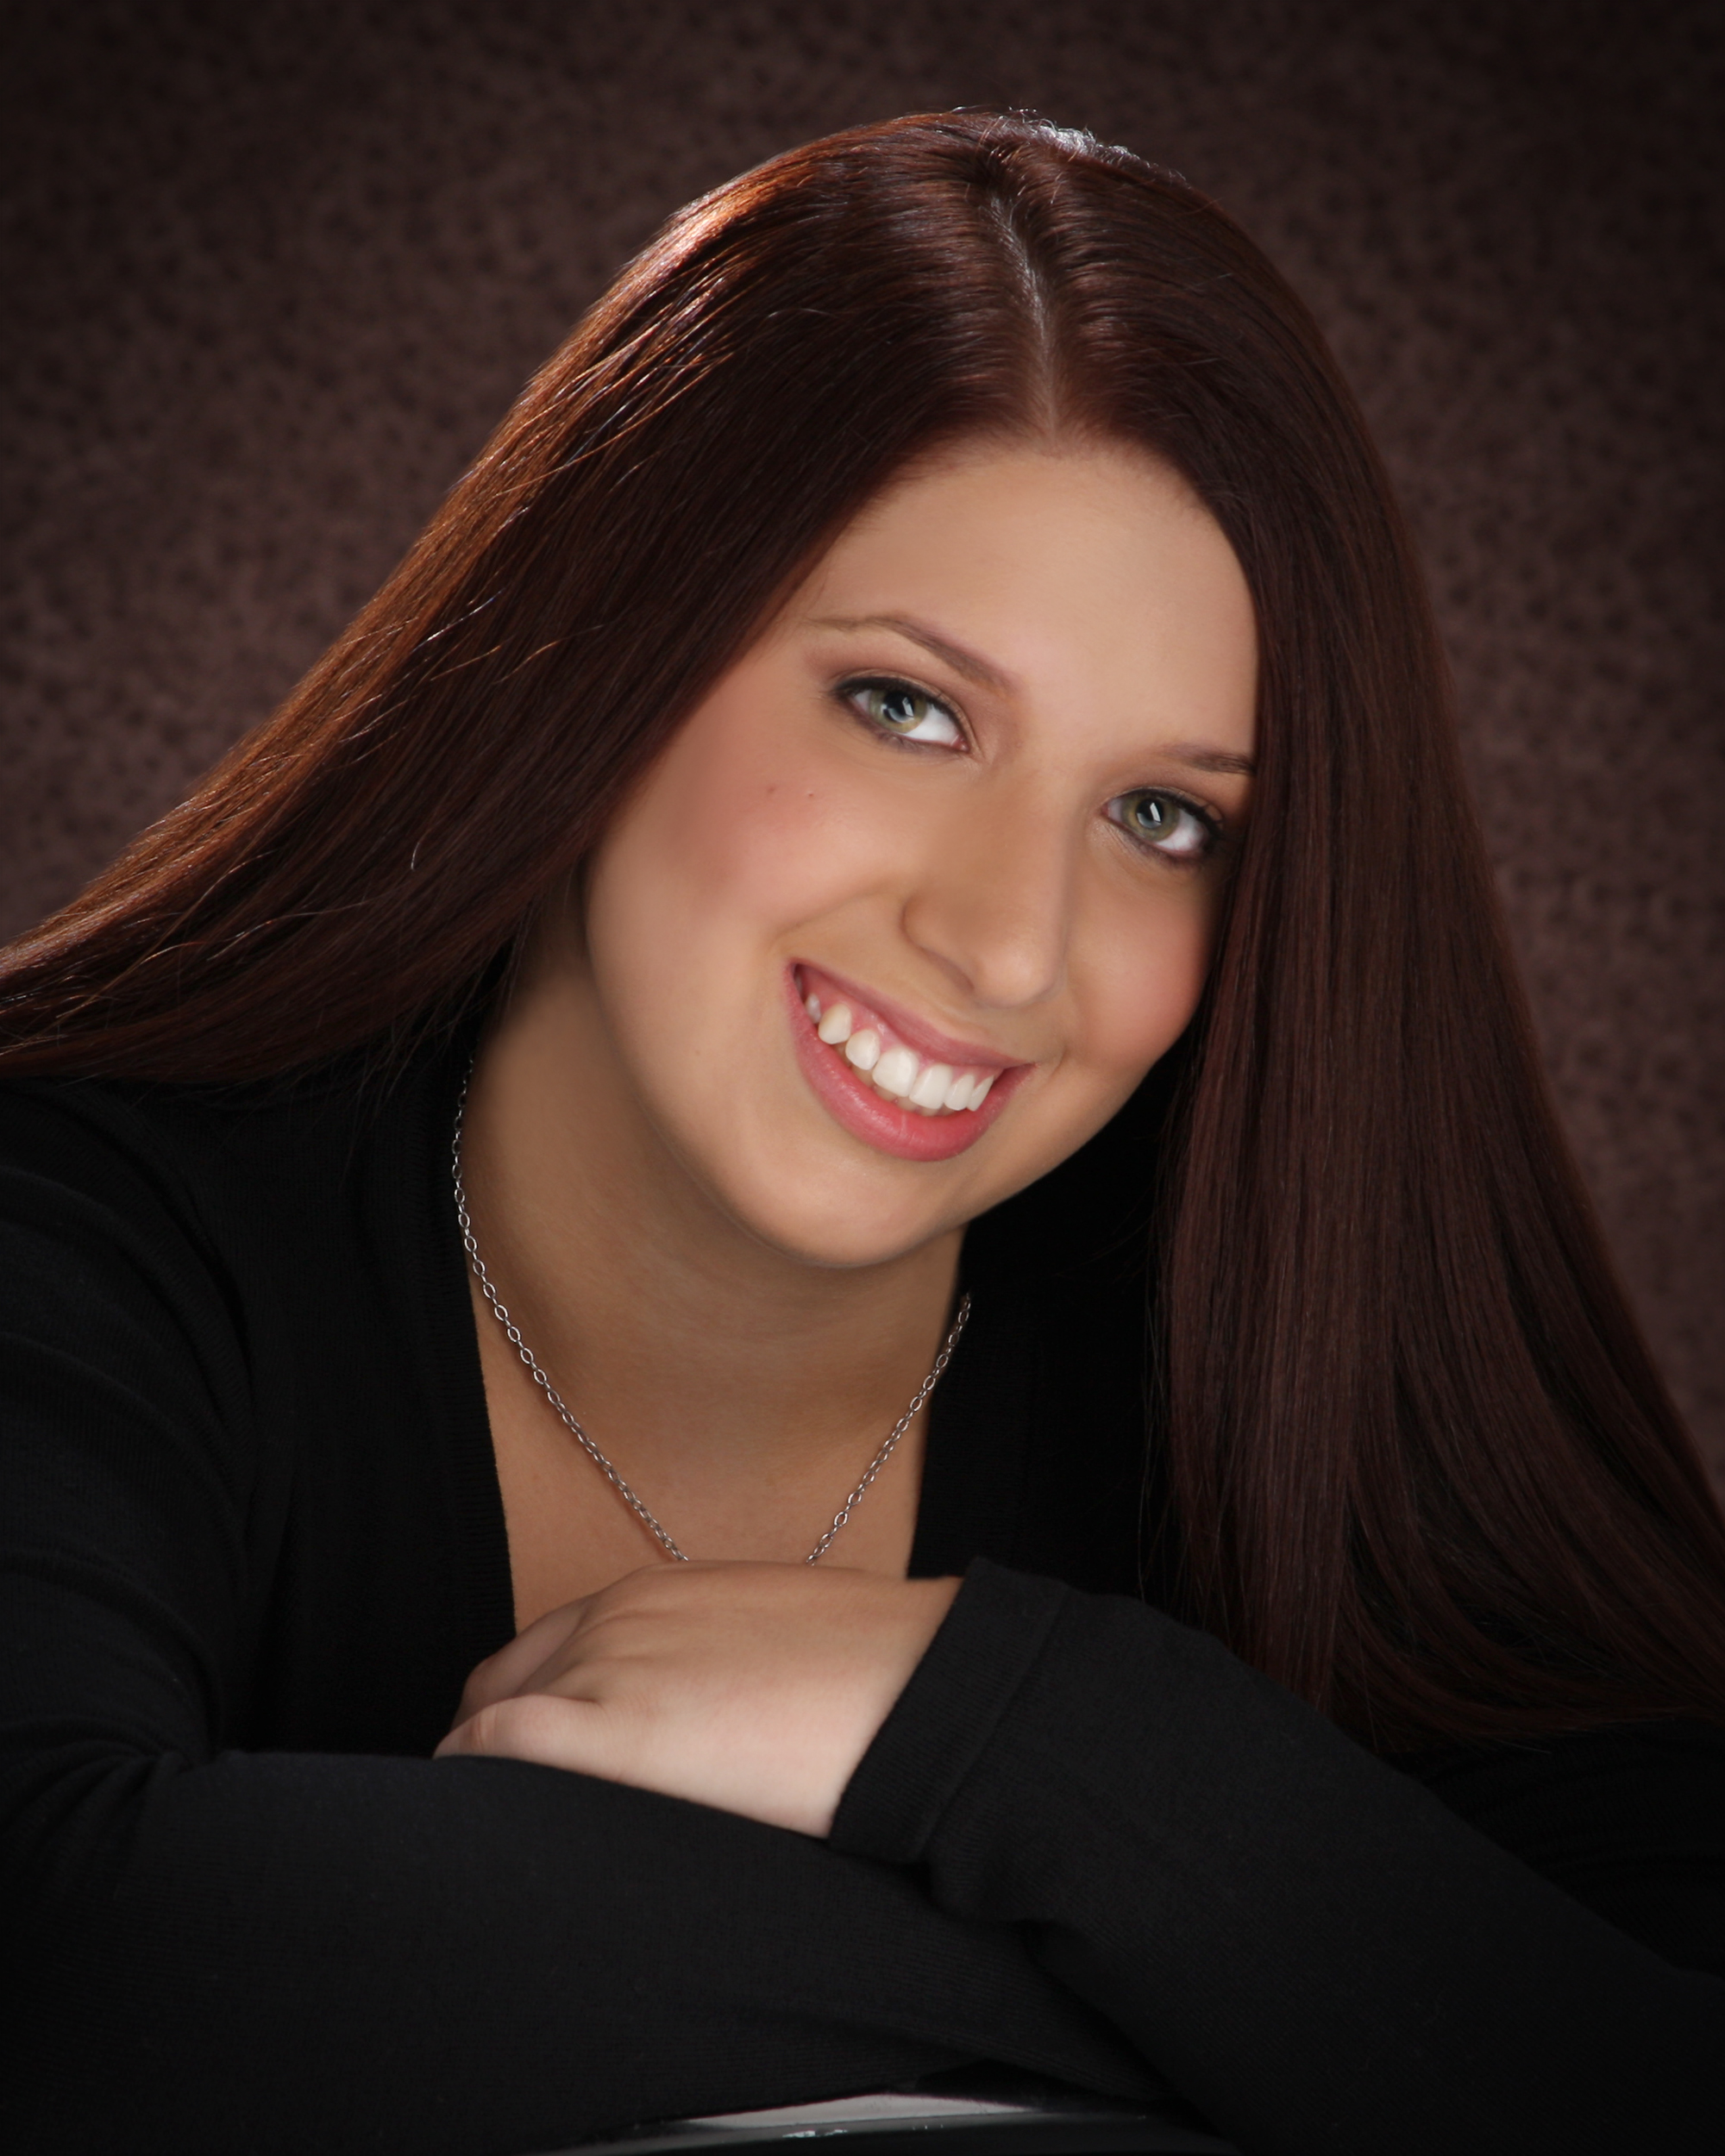 Emily Stillman, 19